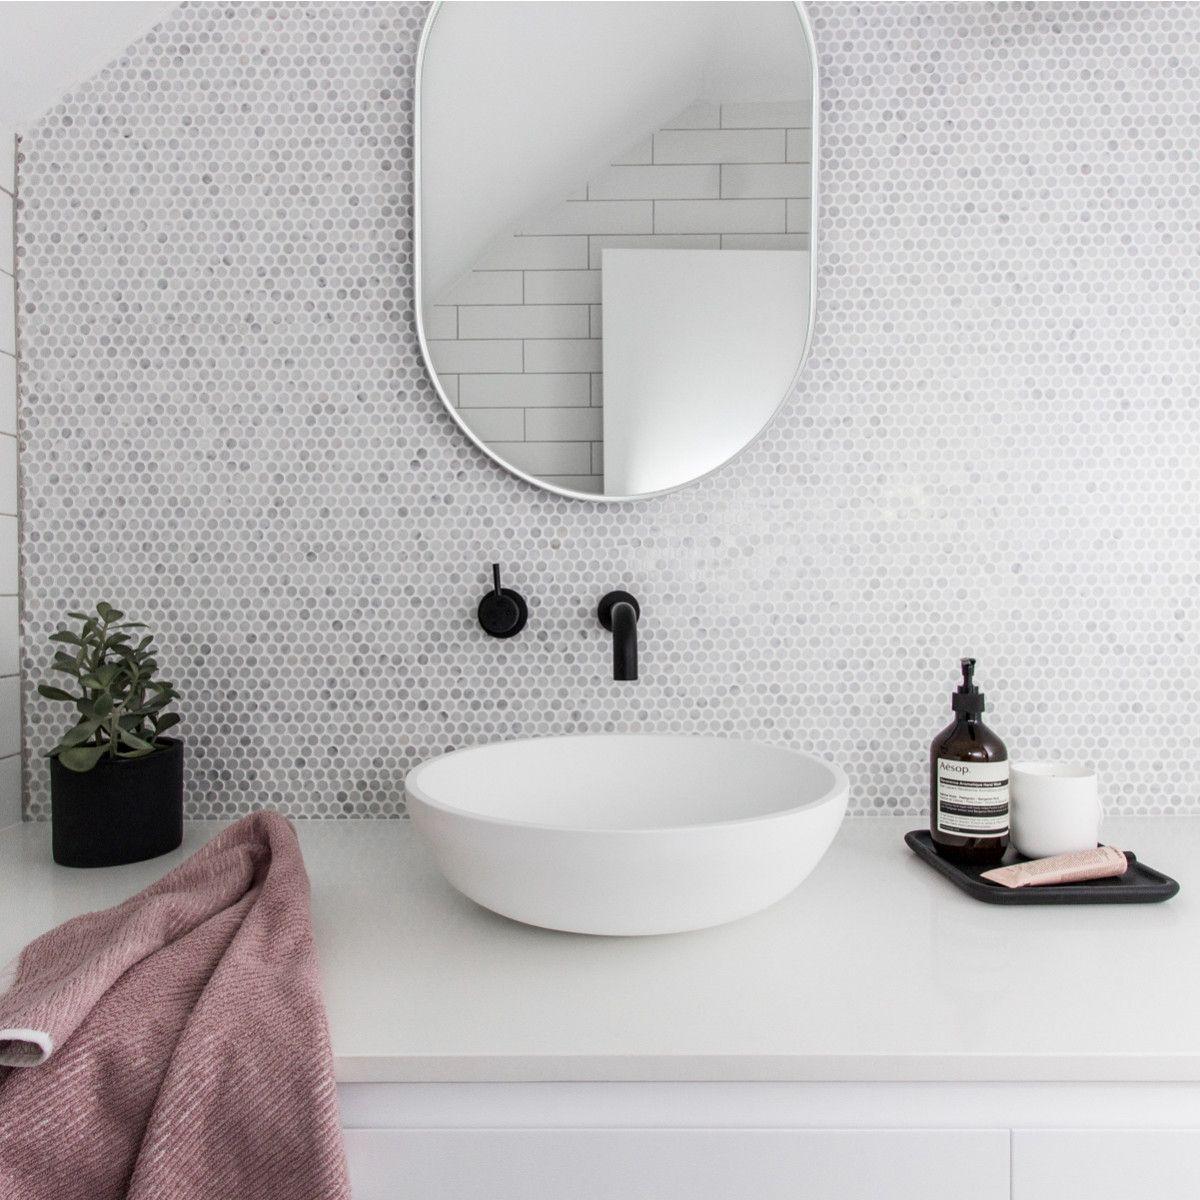 Designstuff Offers A Range Of Contemporary Home Decor Including This Beautiful Bjorn Mirror In White Round Mirror Bathroom Oval Mirror Bathroom Bathroom Mirror